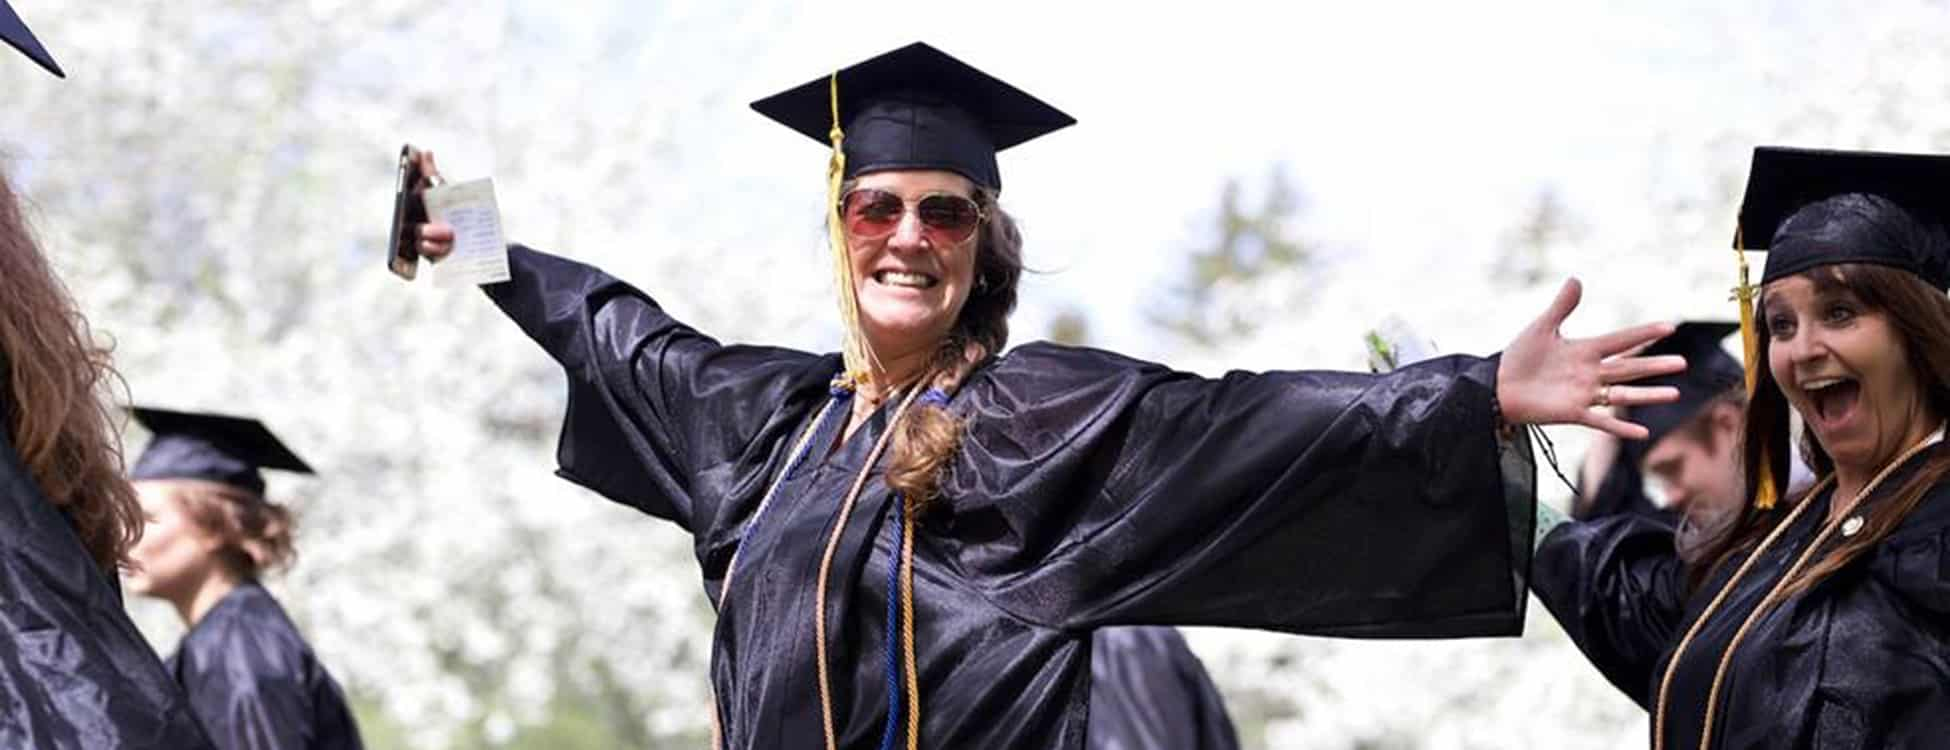 commencement, graduation, happy, smiling, female student